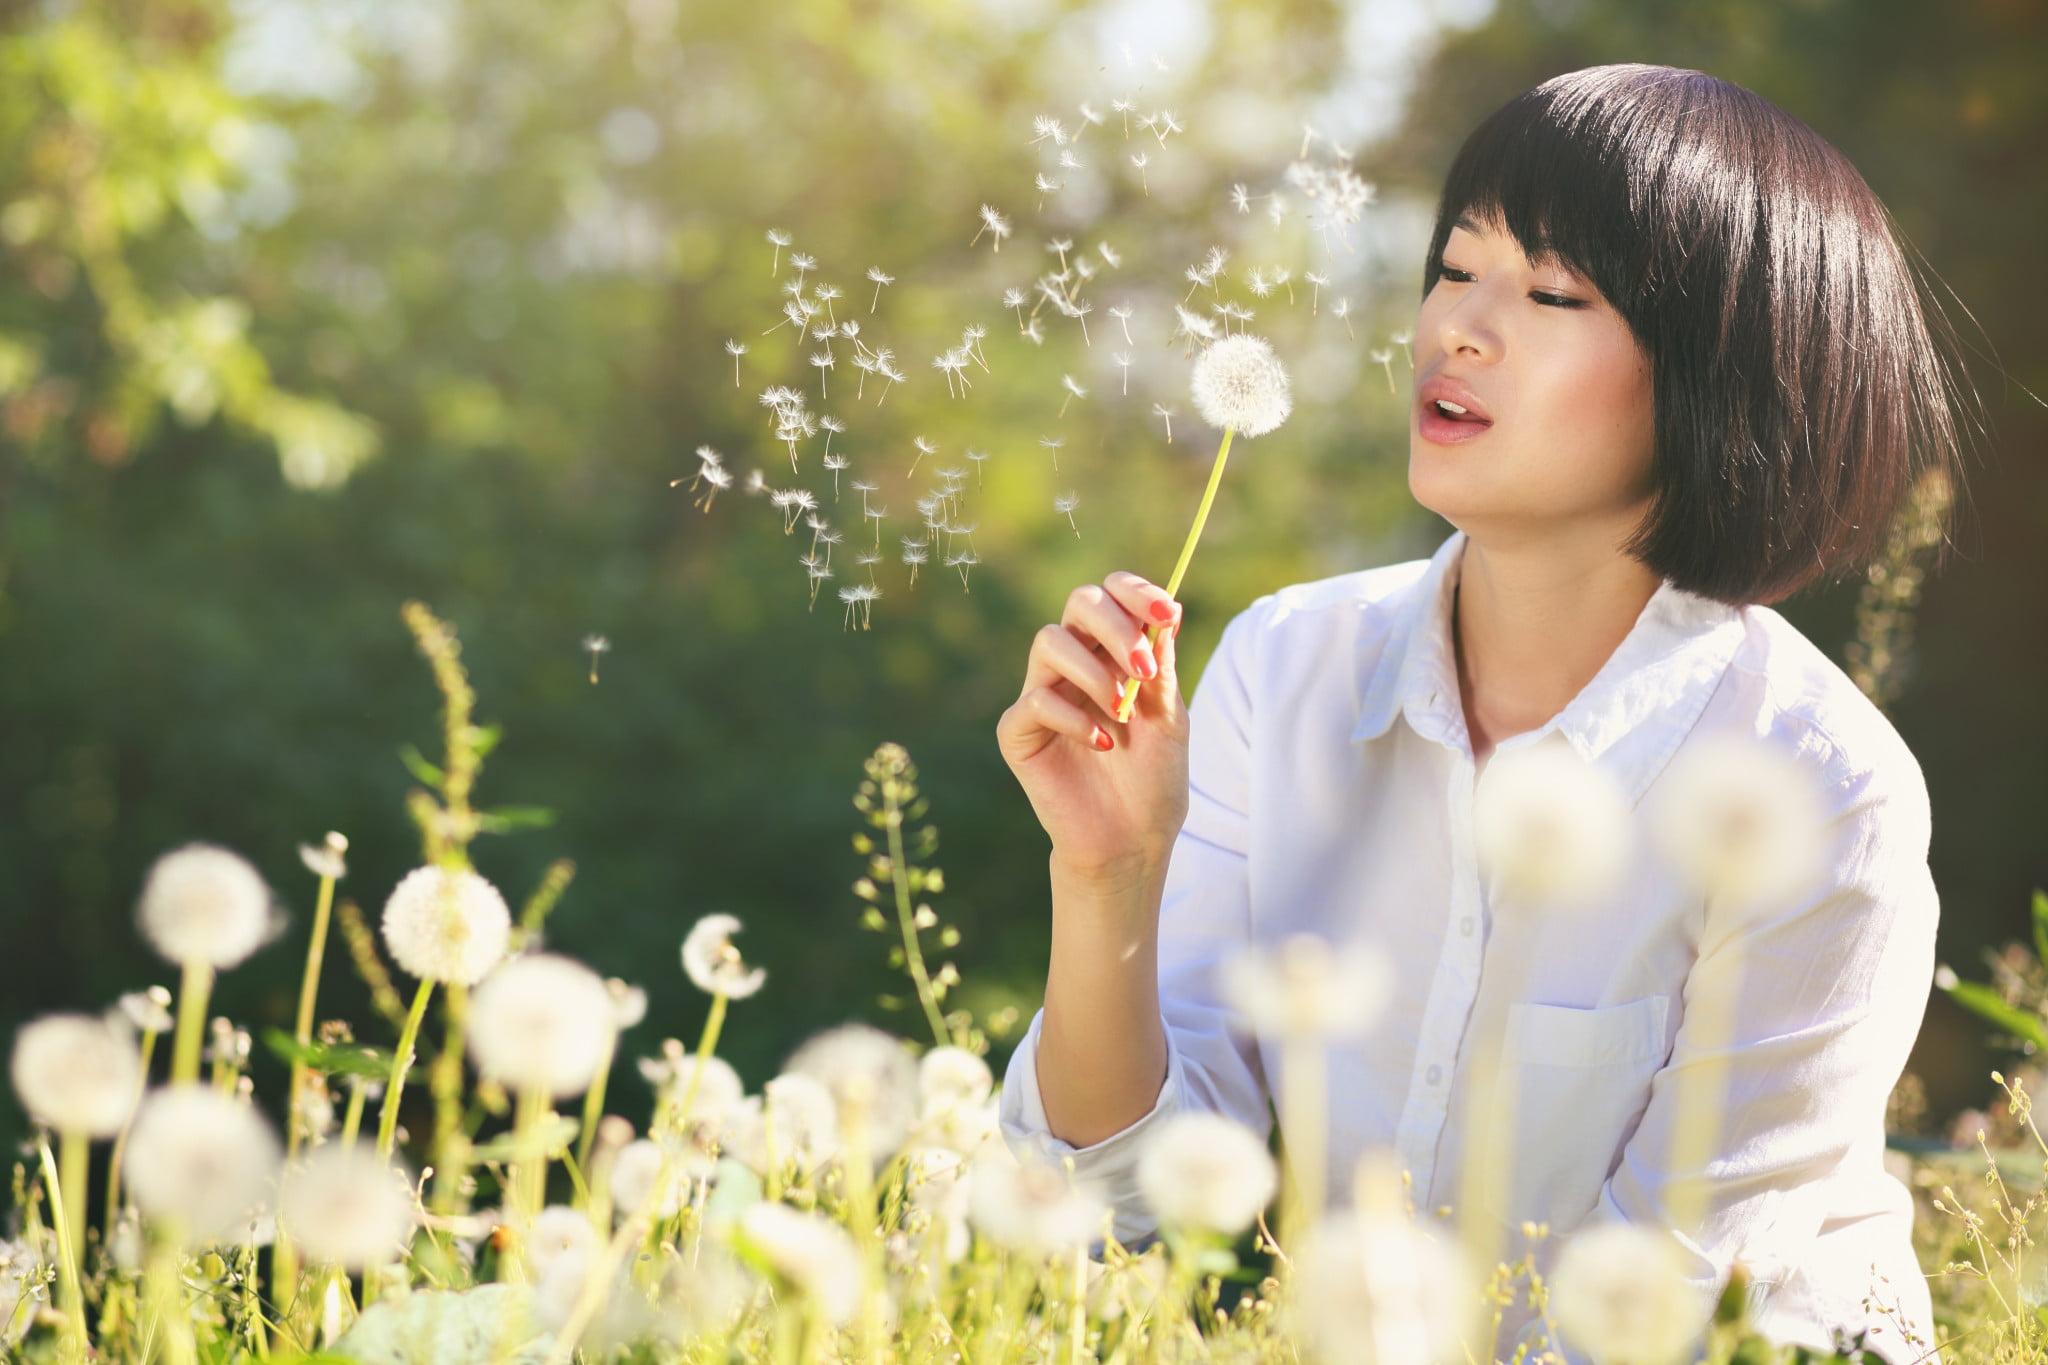 asthmatics - woman blowing dandelion